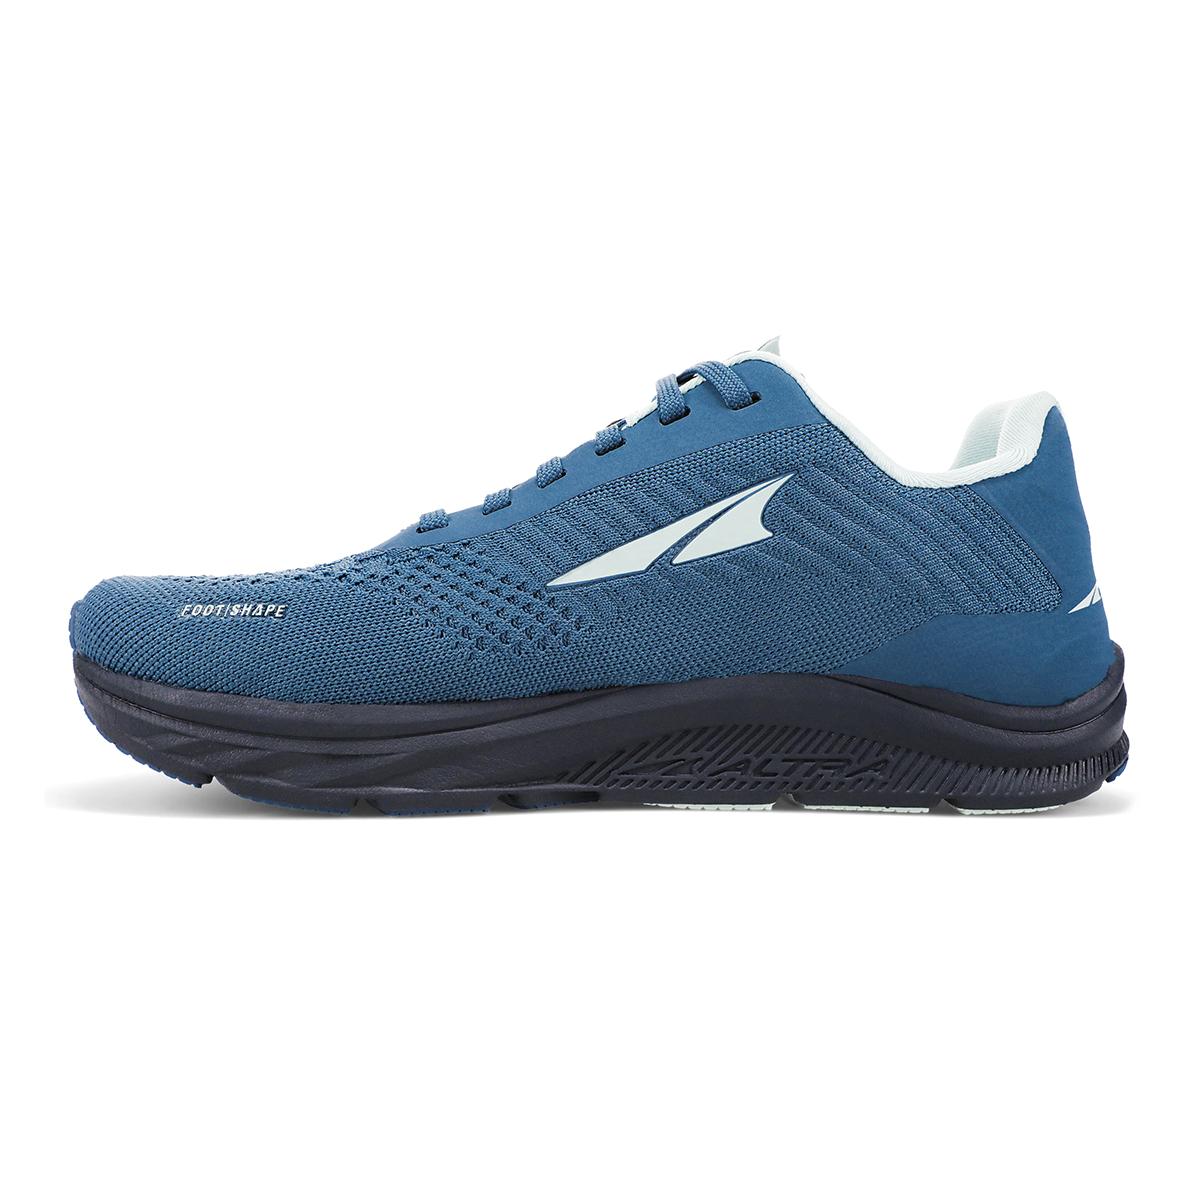 Women's Altra Torin 4.5 Plush Running Shoe - Color: Blue - Size: 7 - Width: Regular, Blue, large, image 4